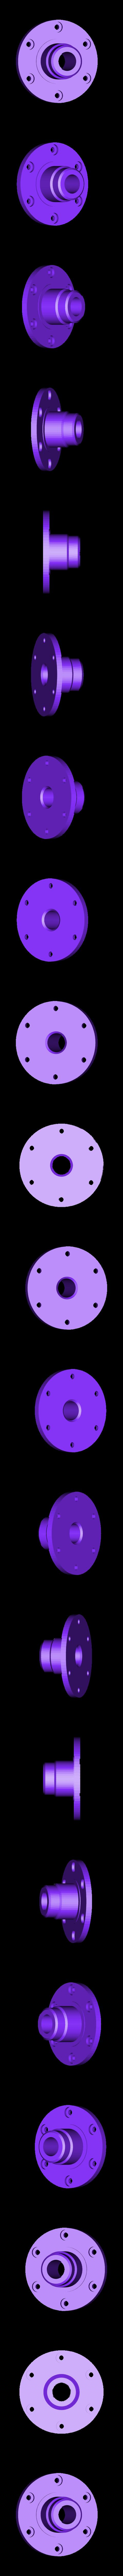 Fan-Shaft01.stl Download free STL file Jet Engine, 3-Spool • 3D printable object, konchan77